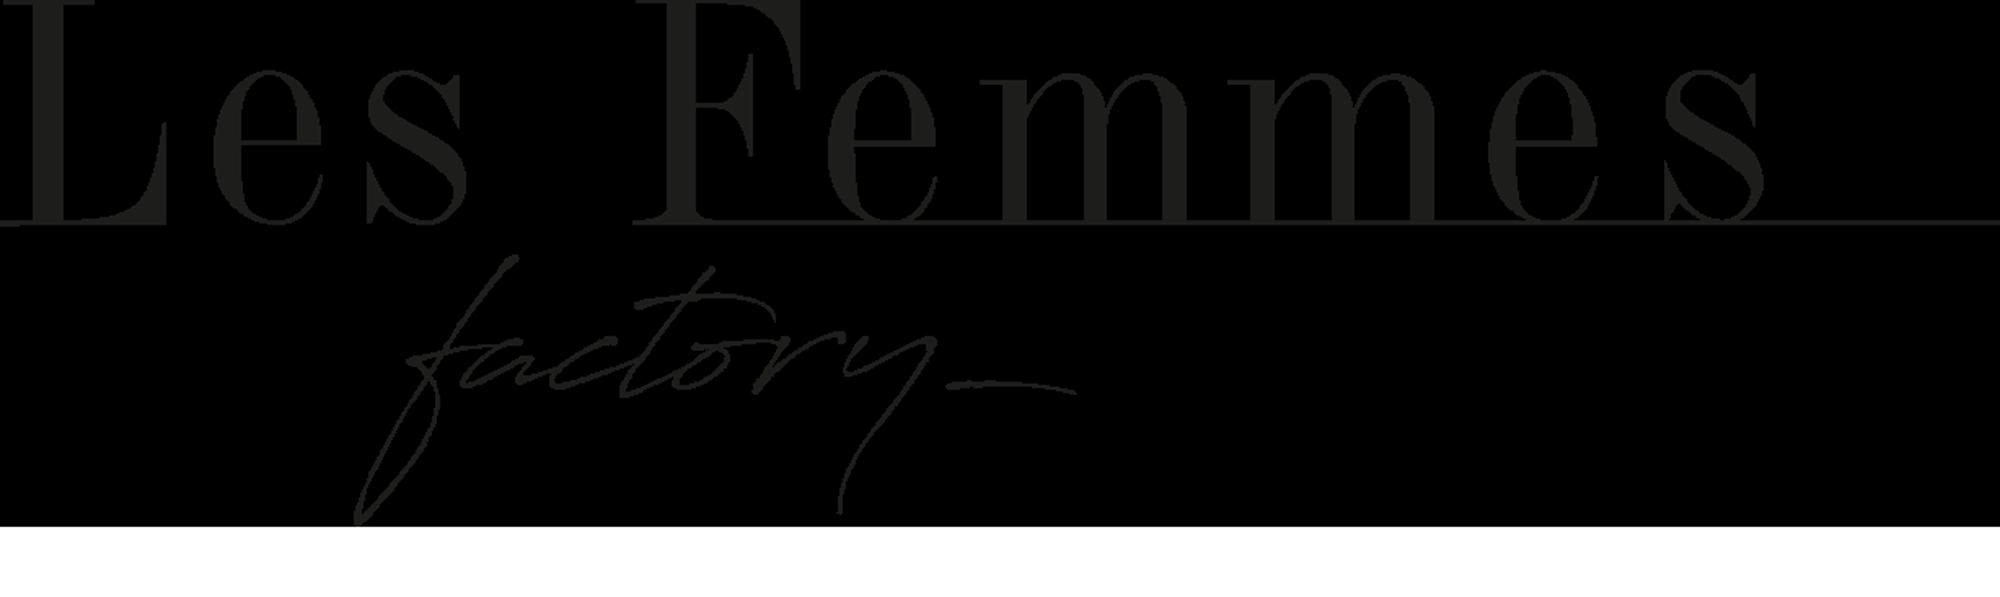 les-factory-femmes-logo